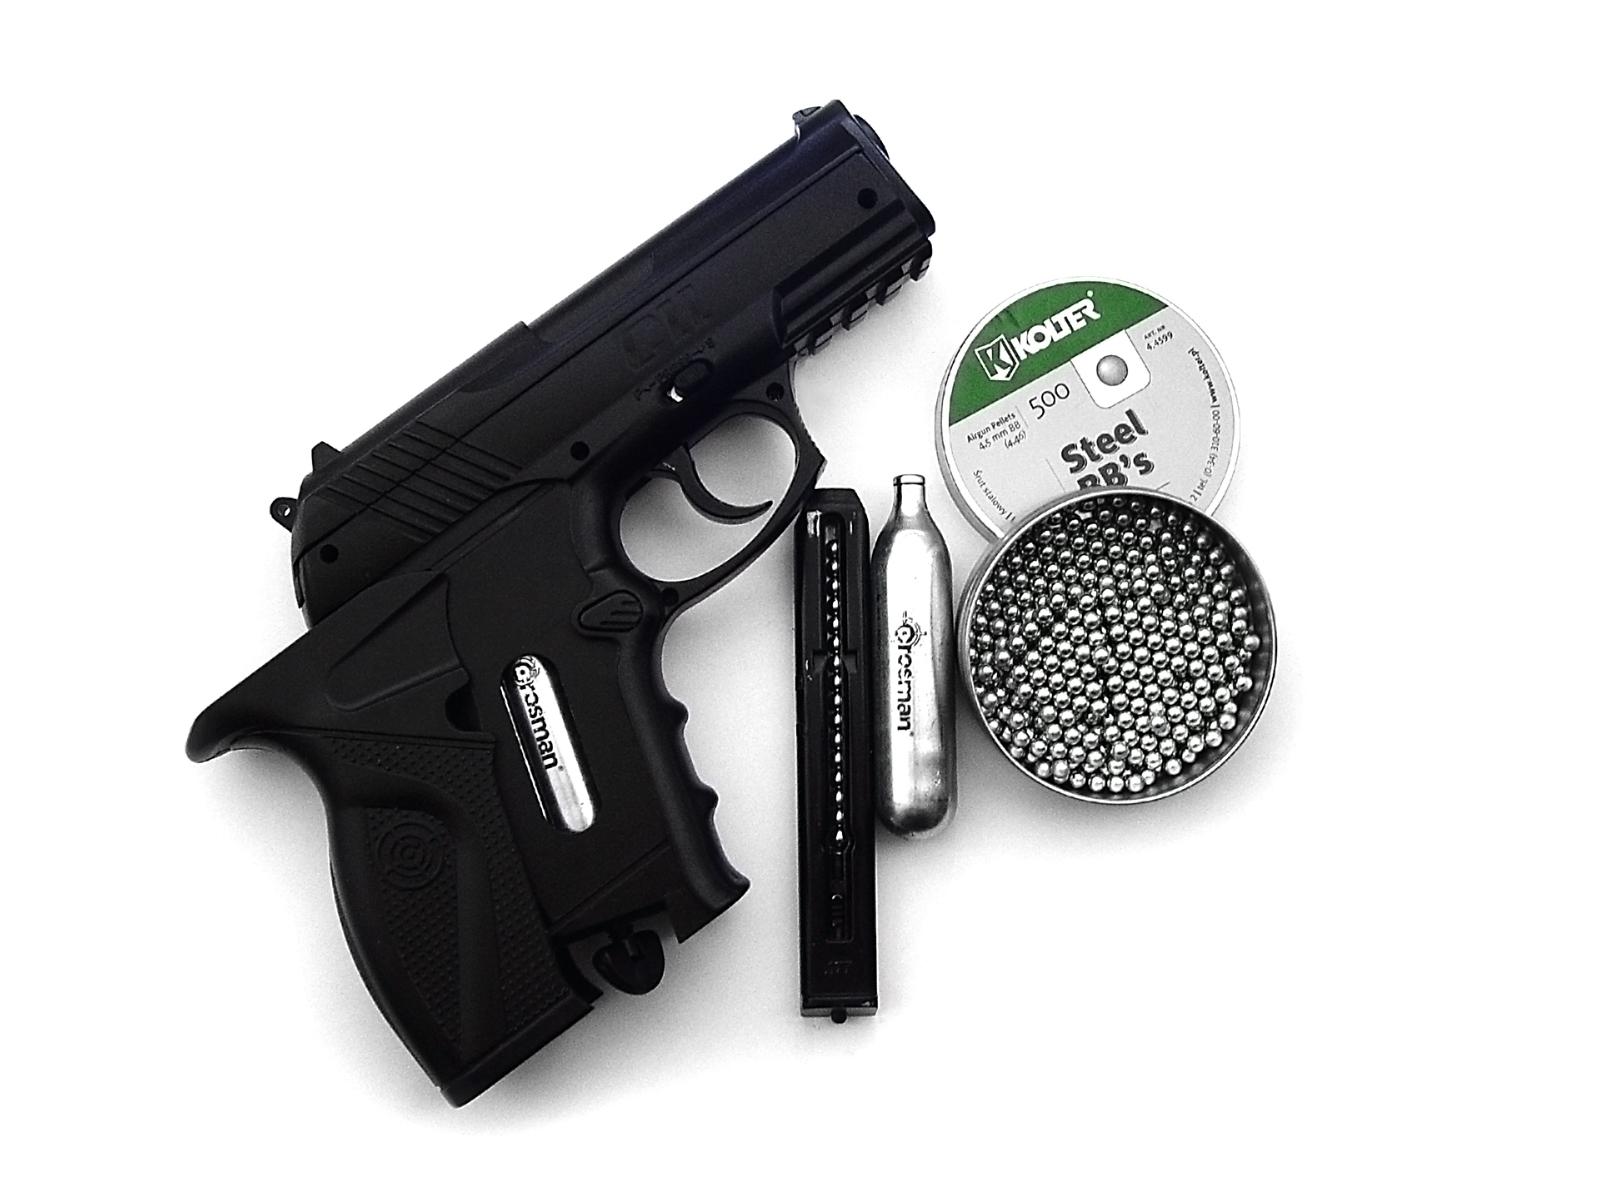 Reseña pistola Co2 Crossman C11 - Taringa!